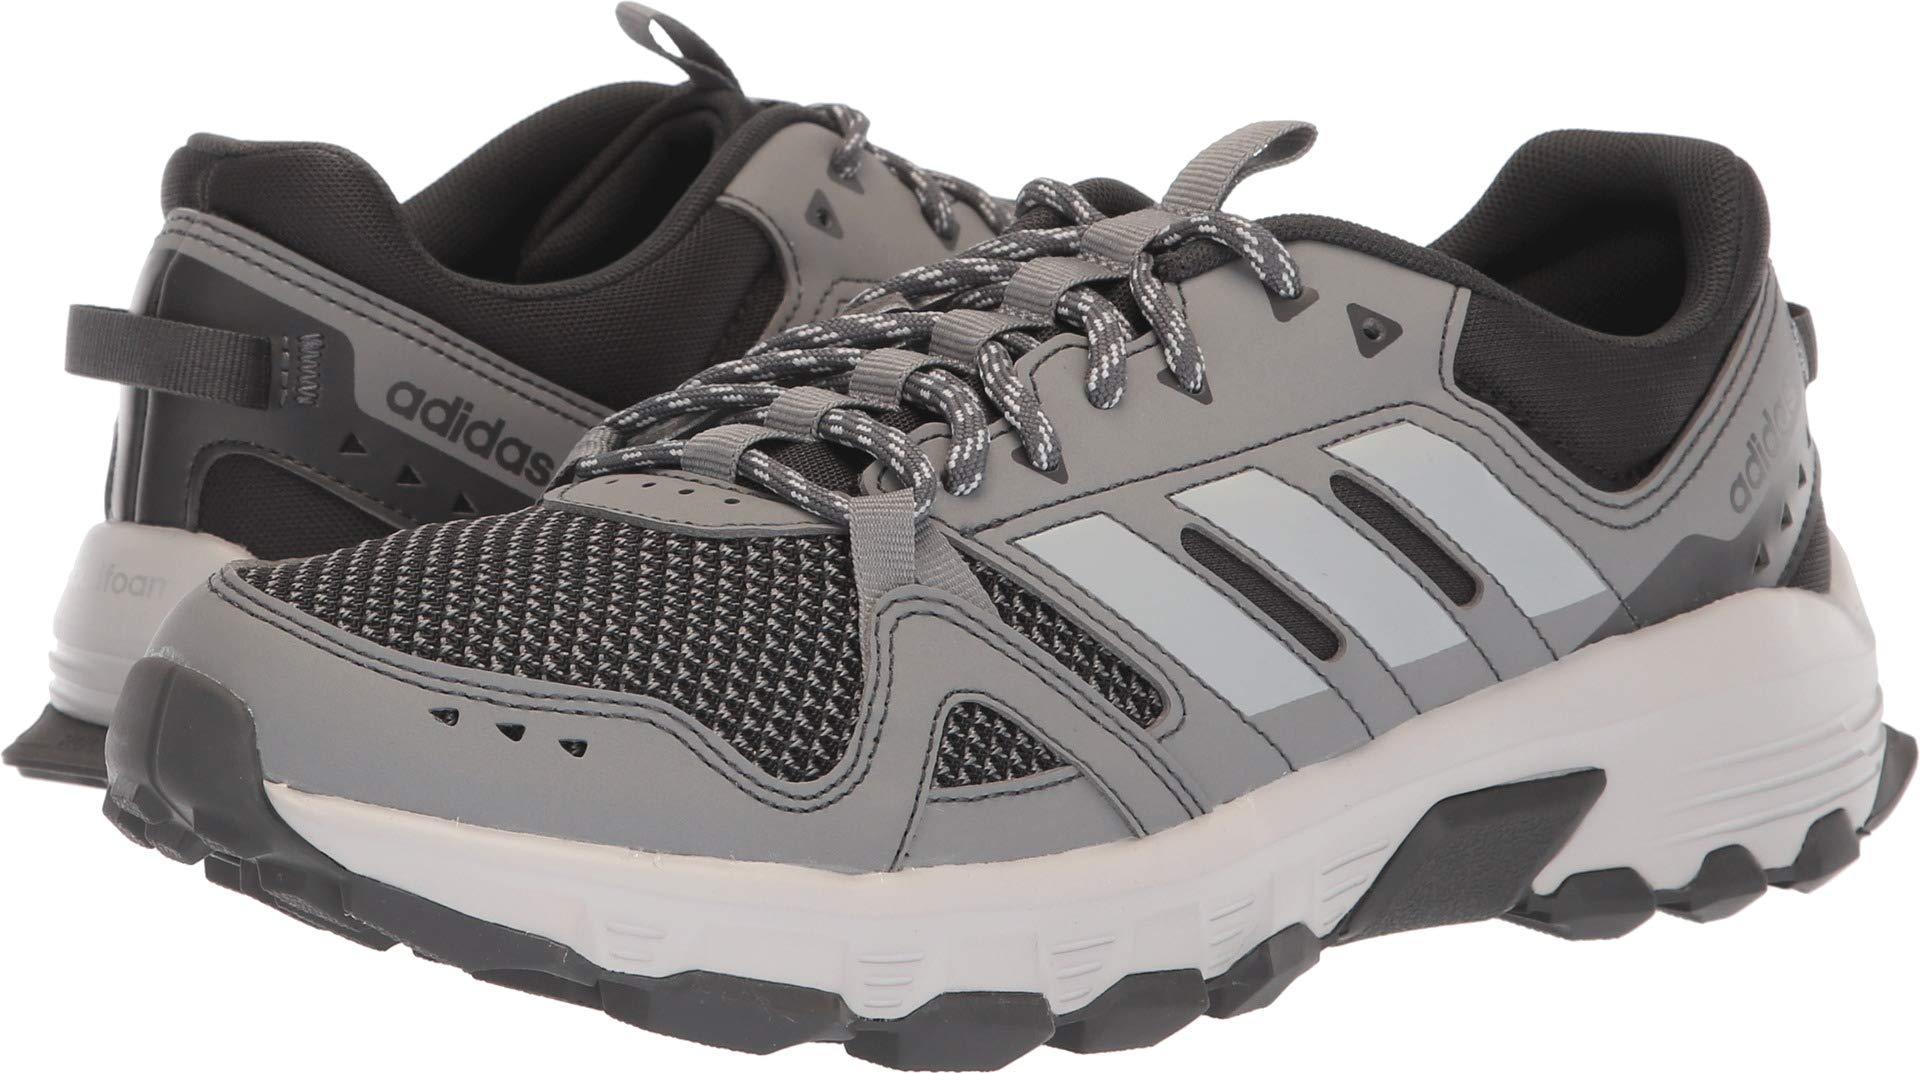 bb58e371aed5d Galleon - Adidas Men s Rockadia Trail Running Shoe